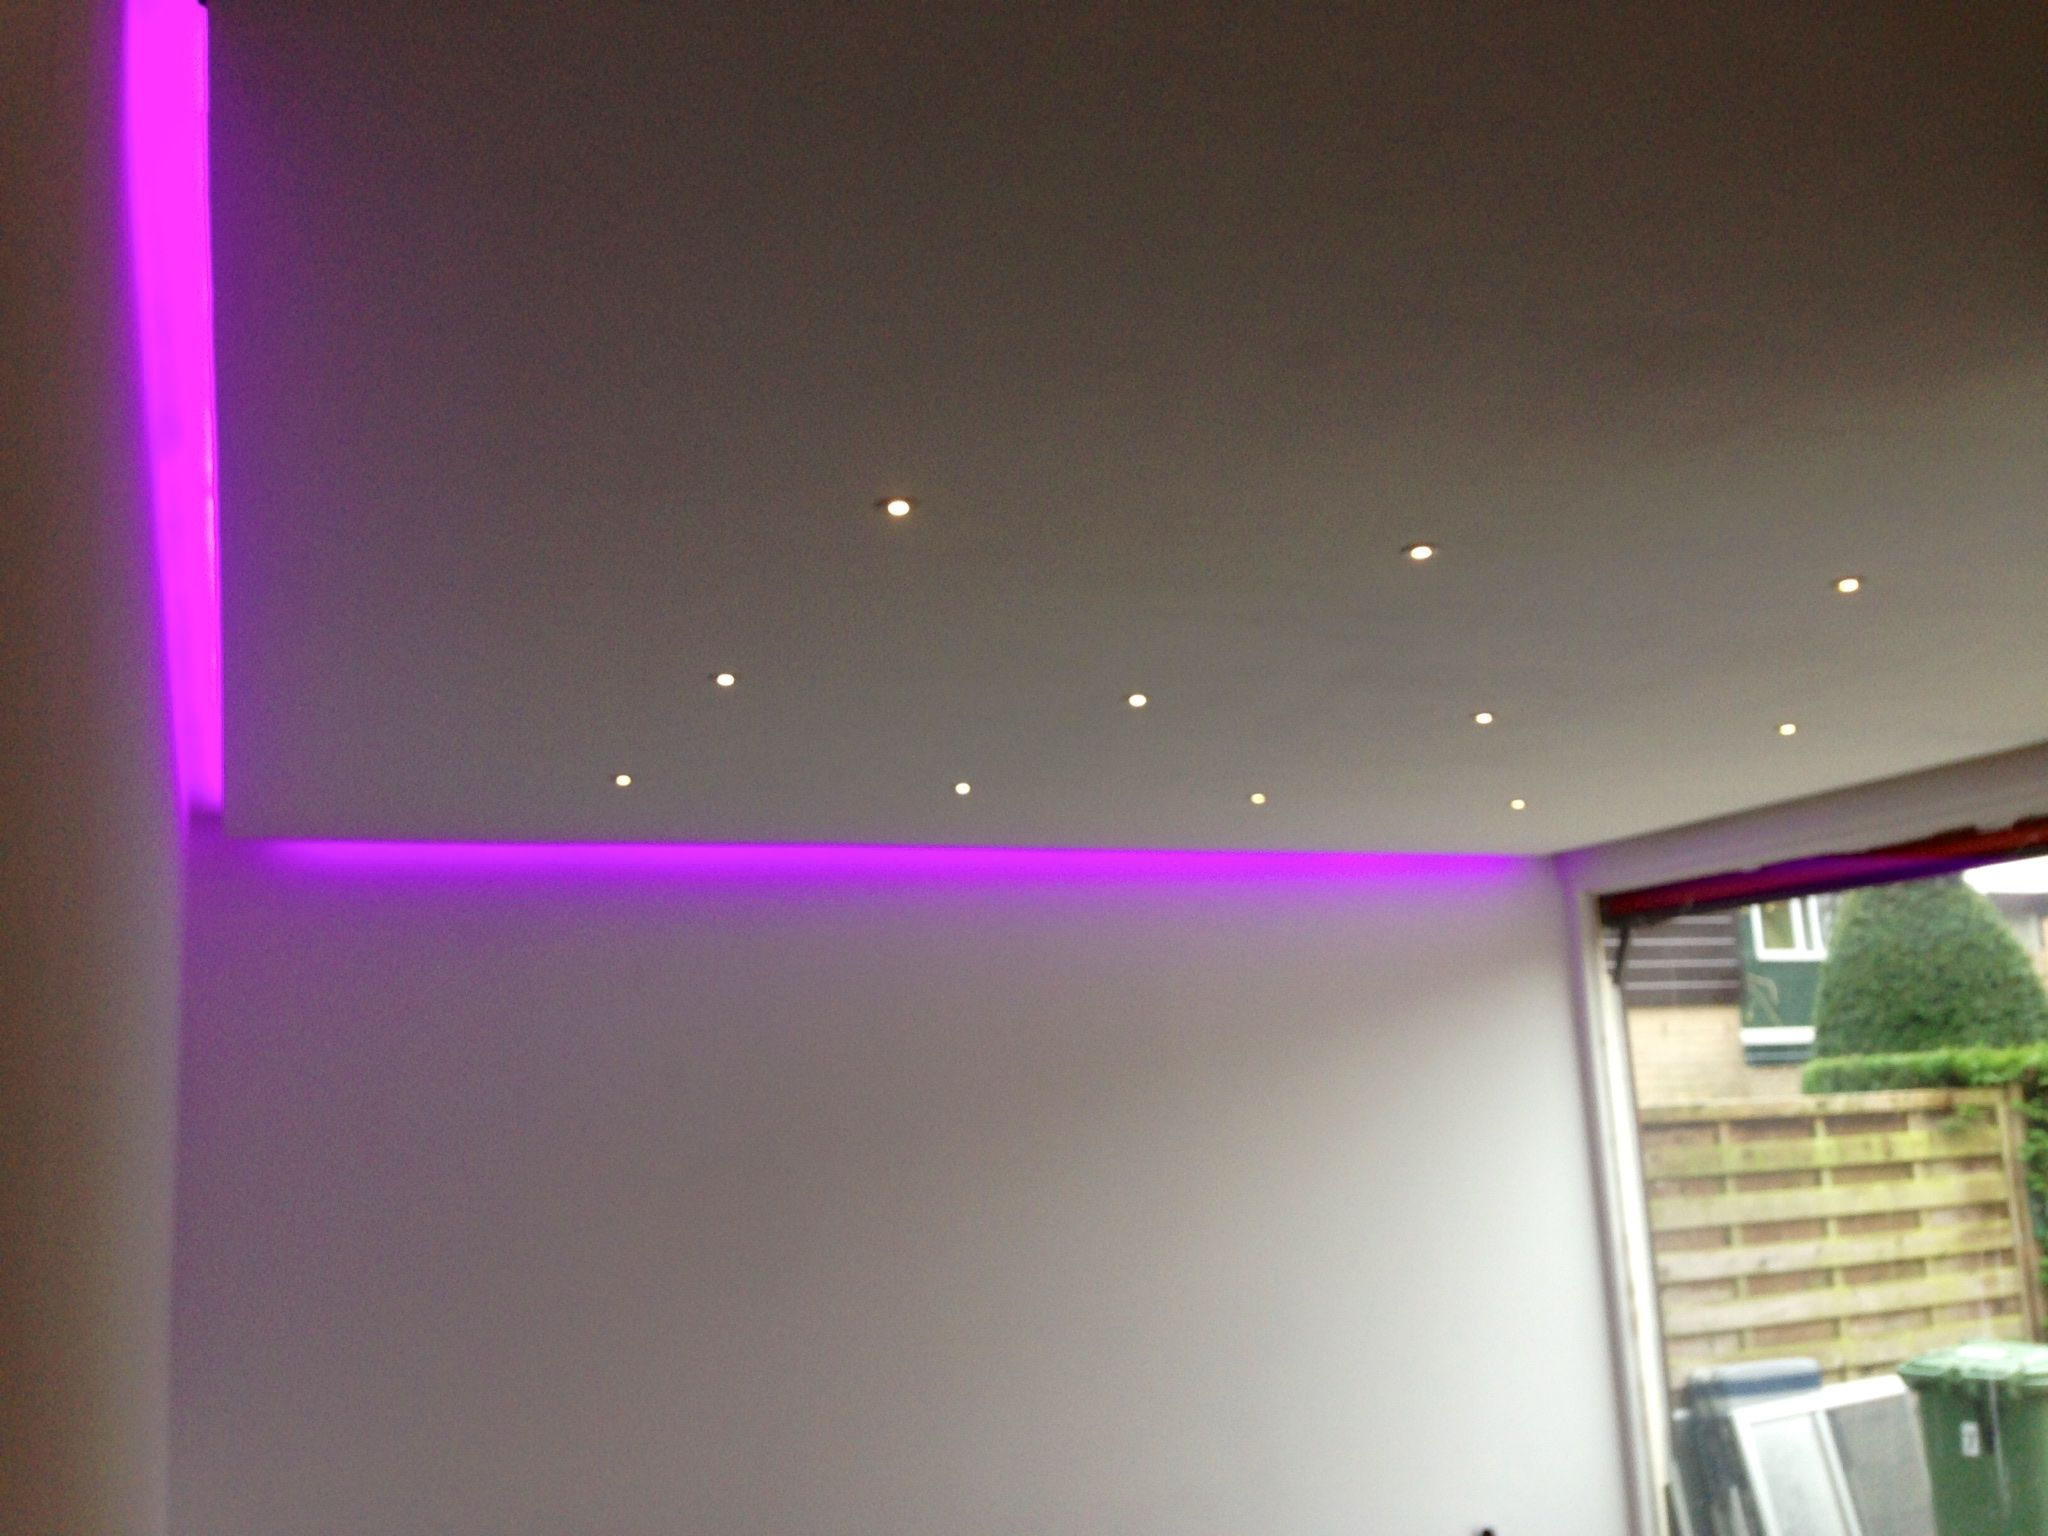 Rgbww Led Strip Langs Het Plafond Verlichting Lichtkoord Led